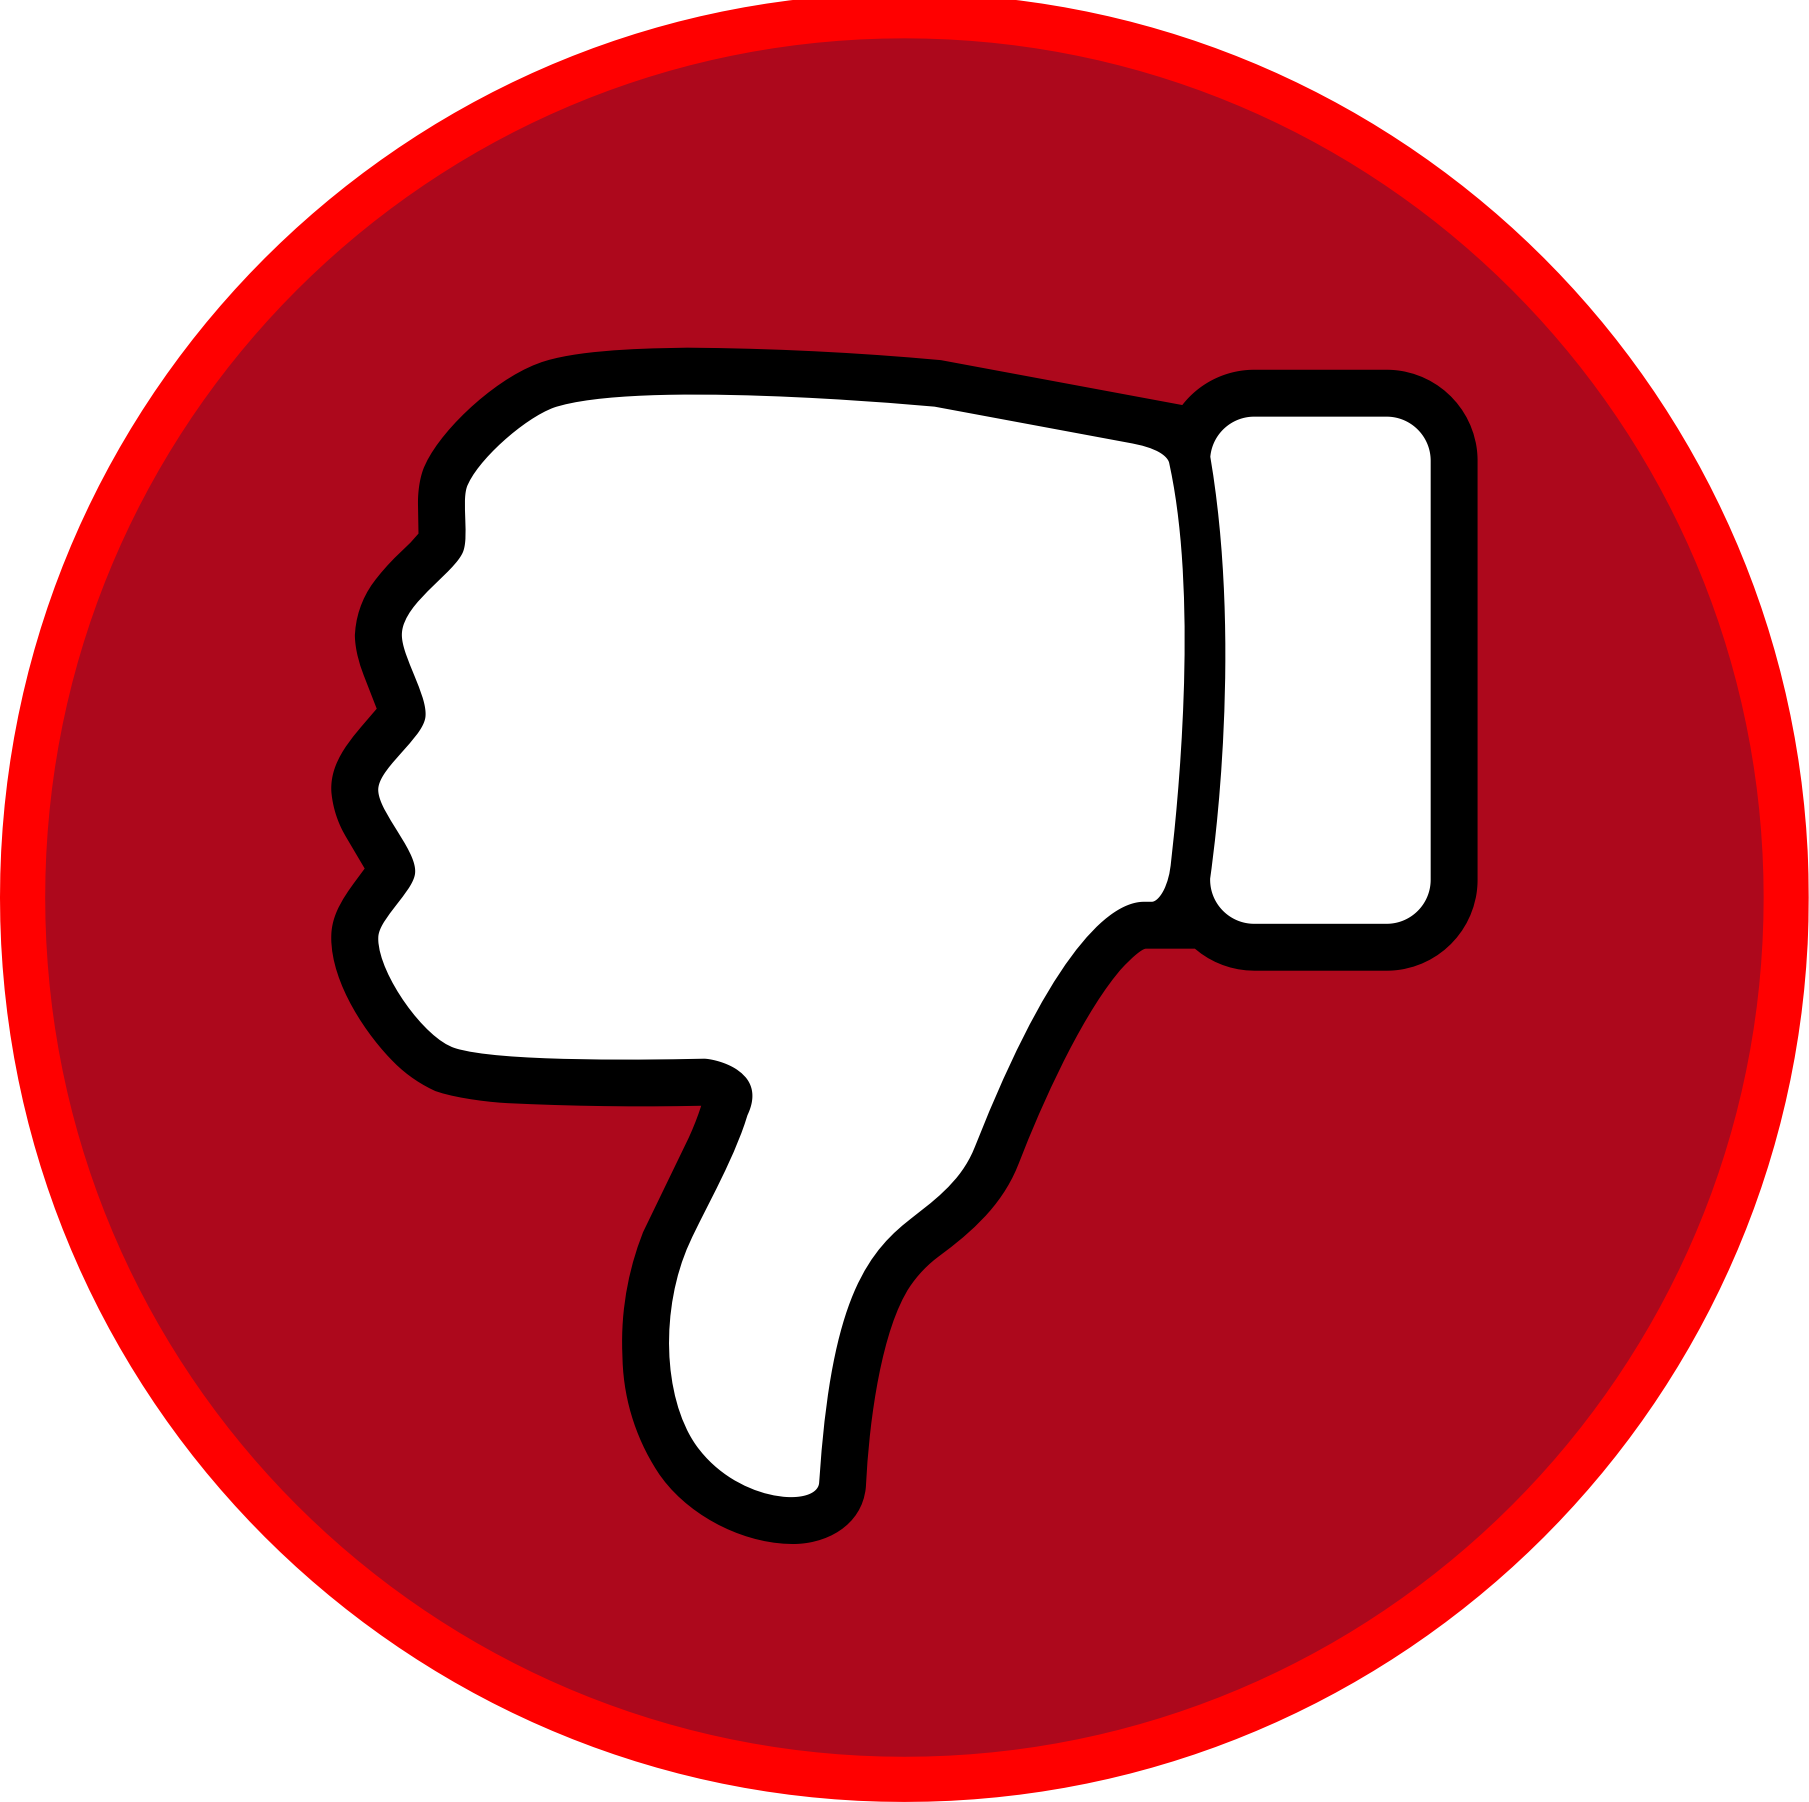 Thumb down icon clipart clip transparent library Free Thumbs Down, Download Free Clip Art, Free Clip Art on Clipart ... clip transparent library